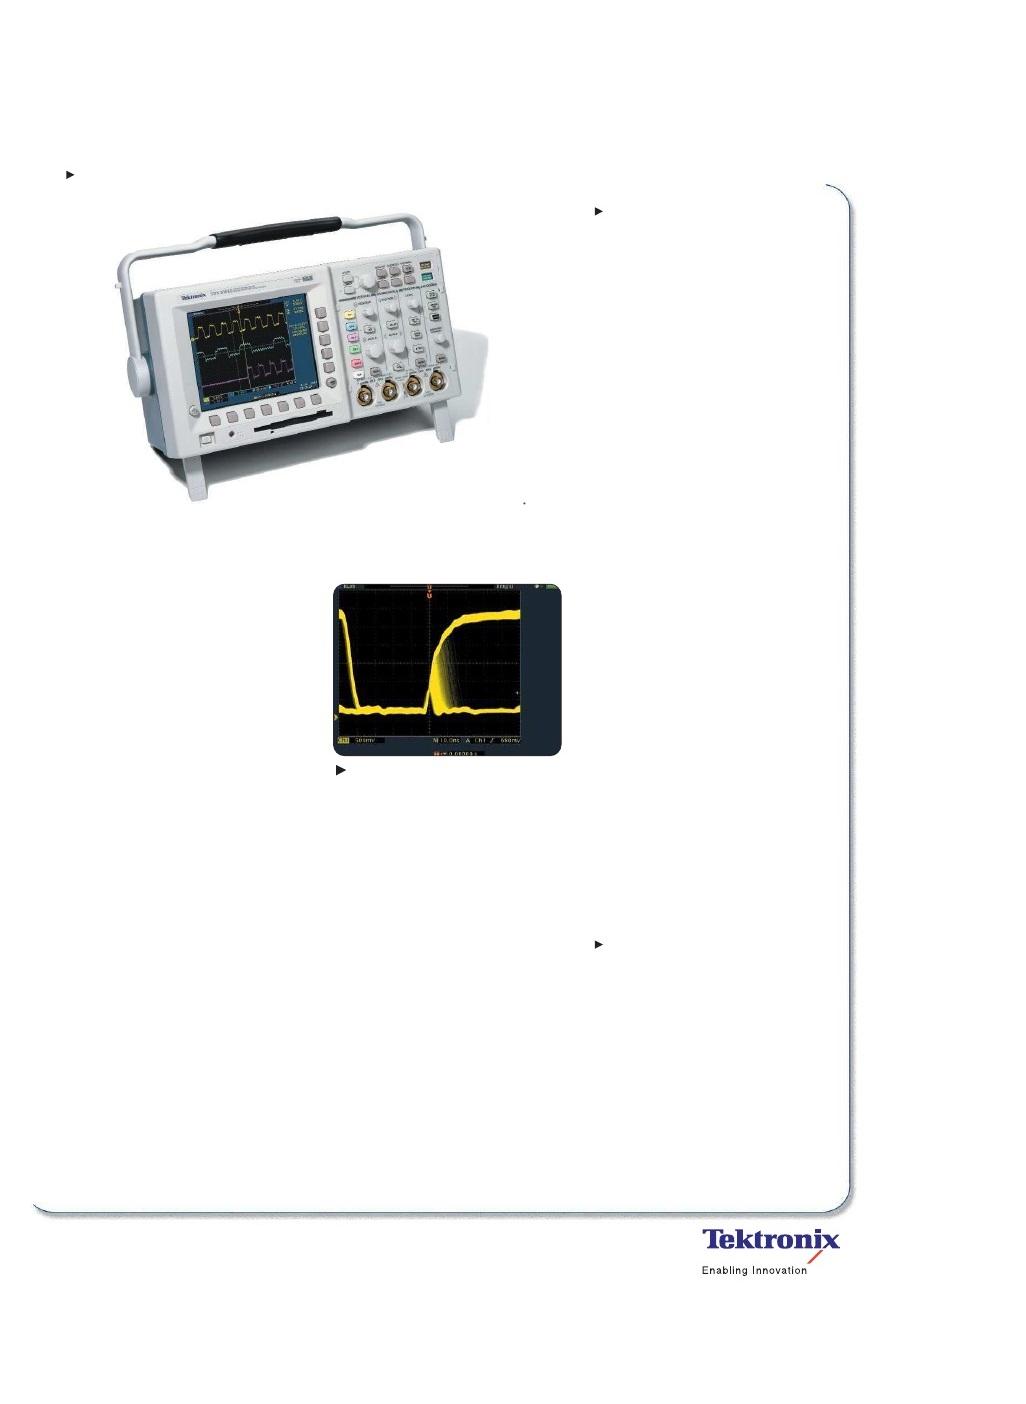 lcd oscilloscope